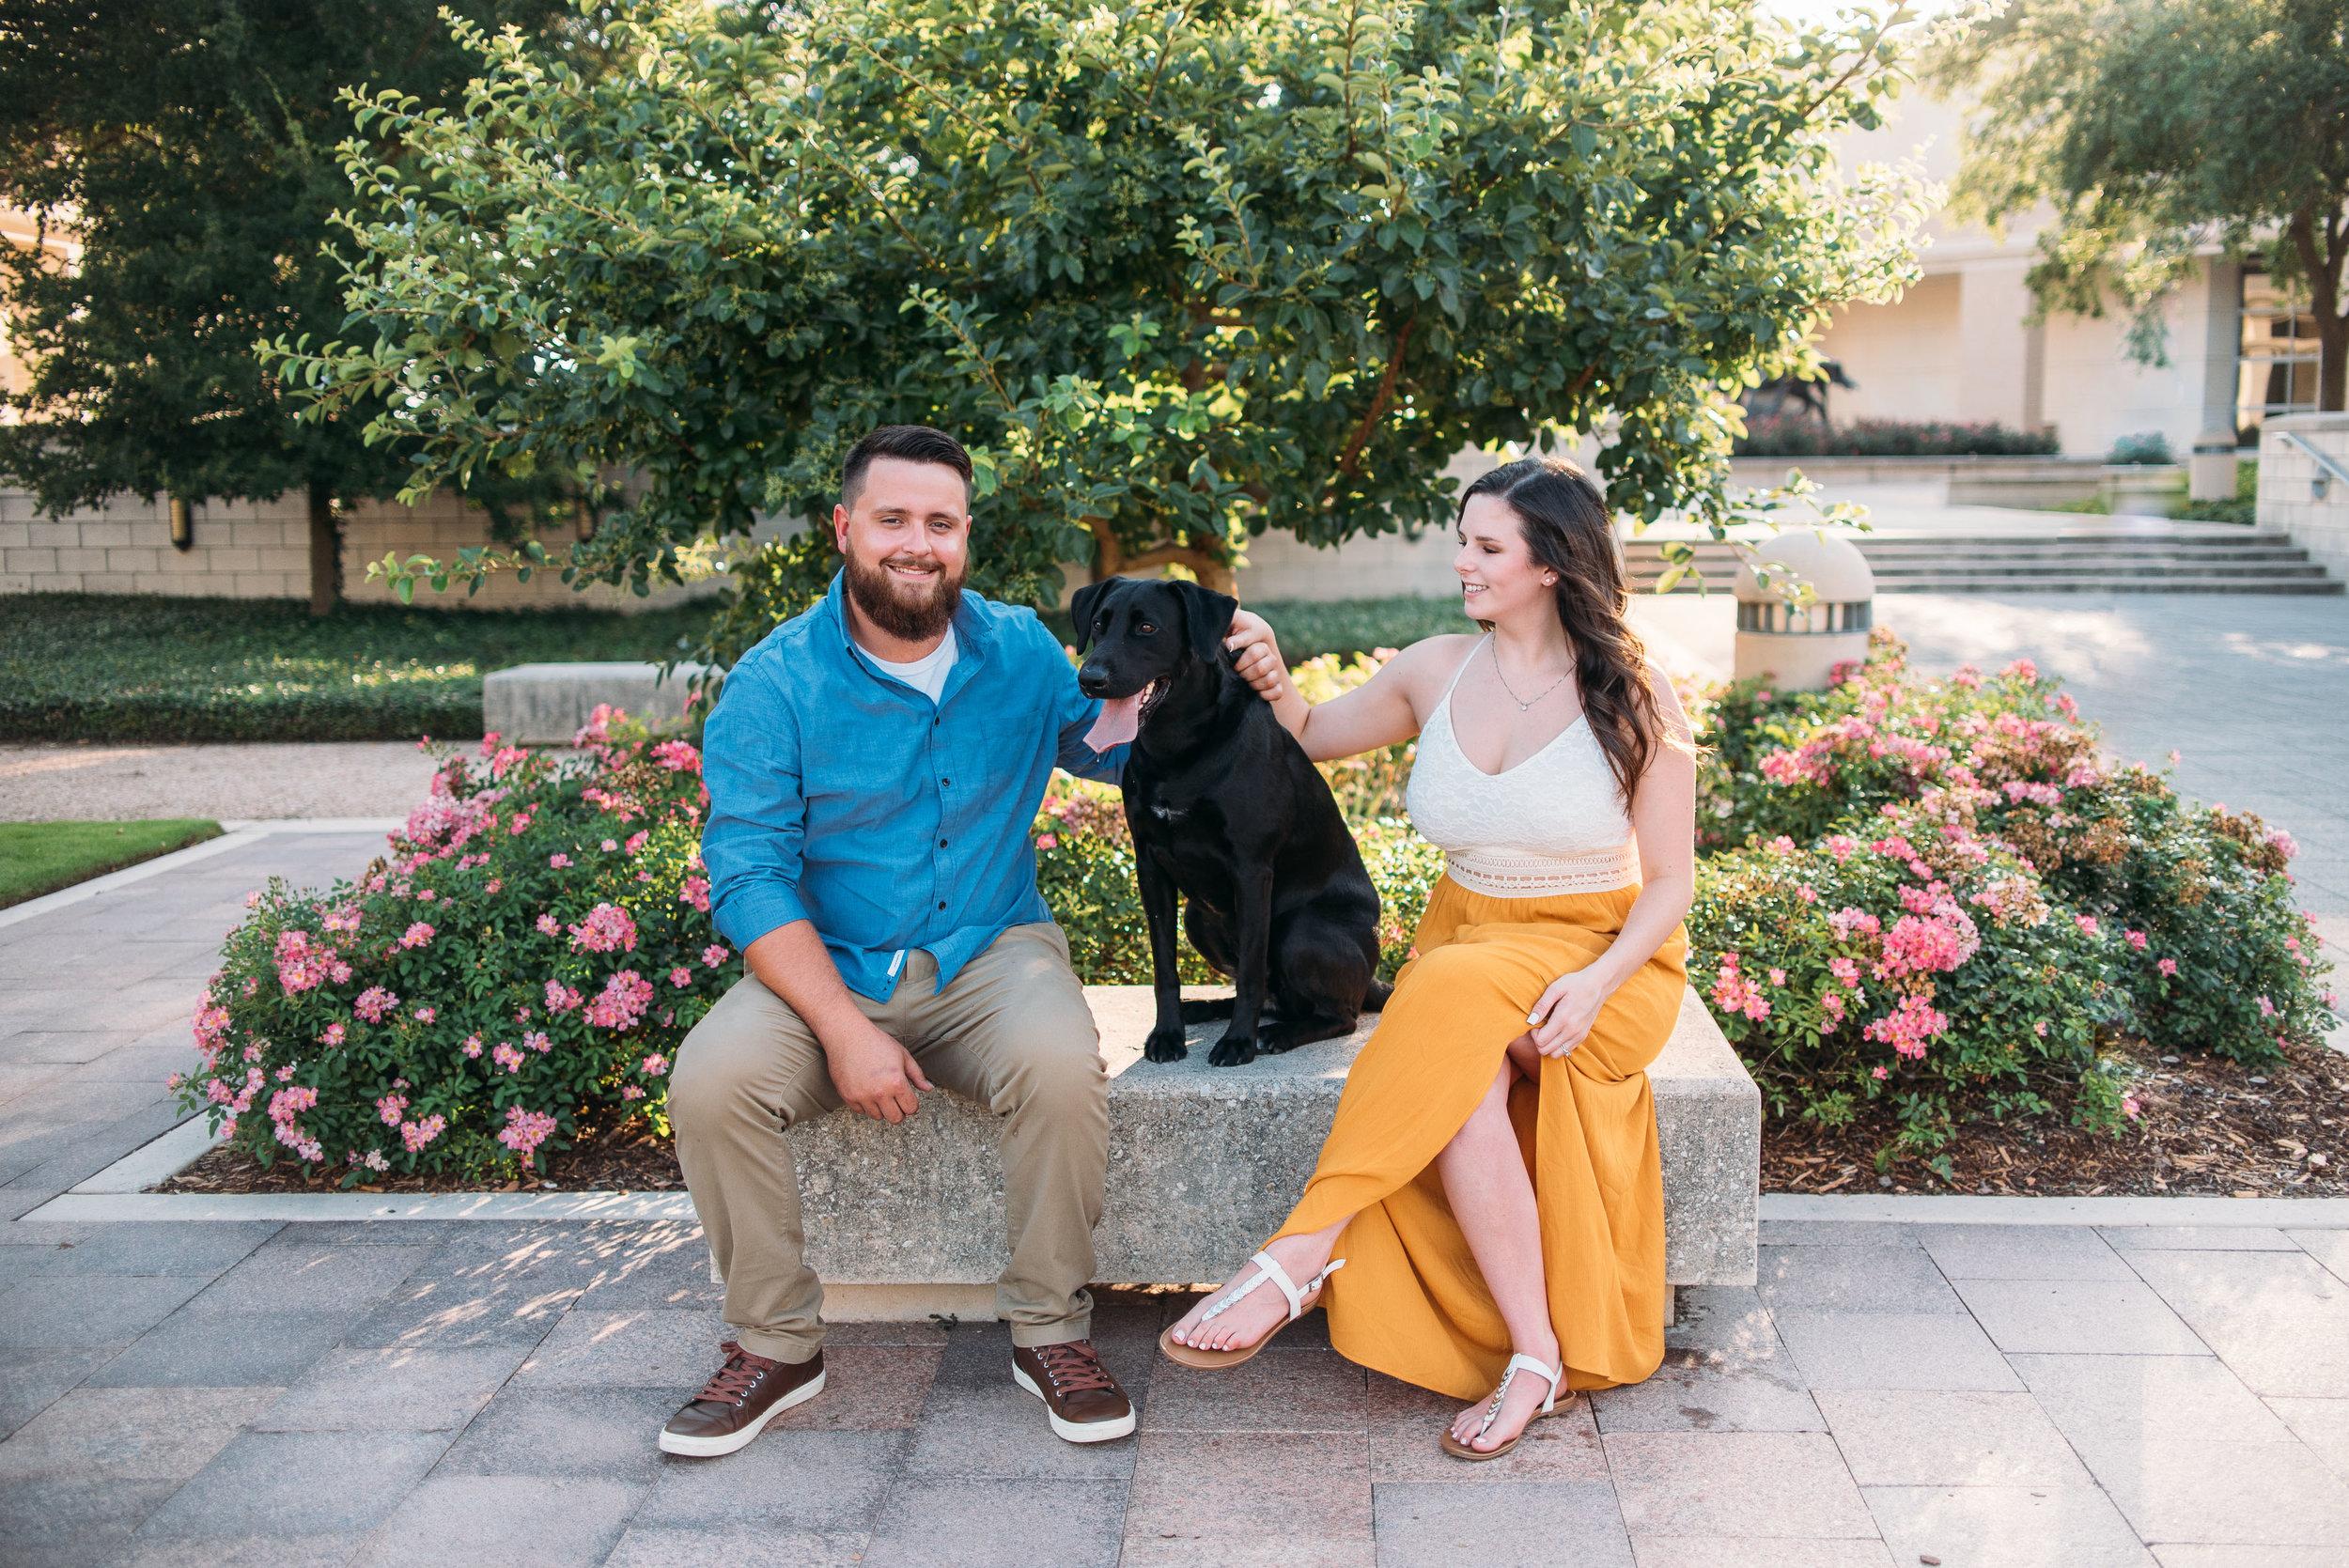 George-Bush-Library-Texas-A&M-University-Engagement-College-Station-Wedding-Photographer-San-Angel-Photo-Mark-Jenna-Matt-Century-Tree-06.jpg